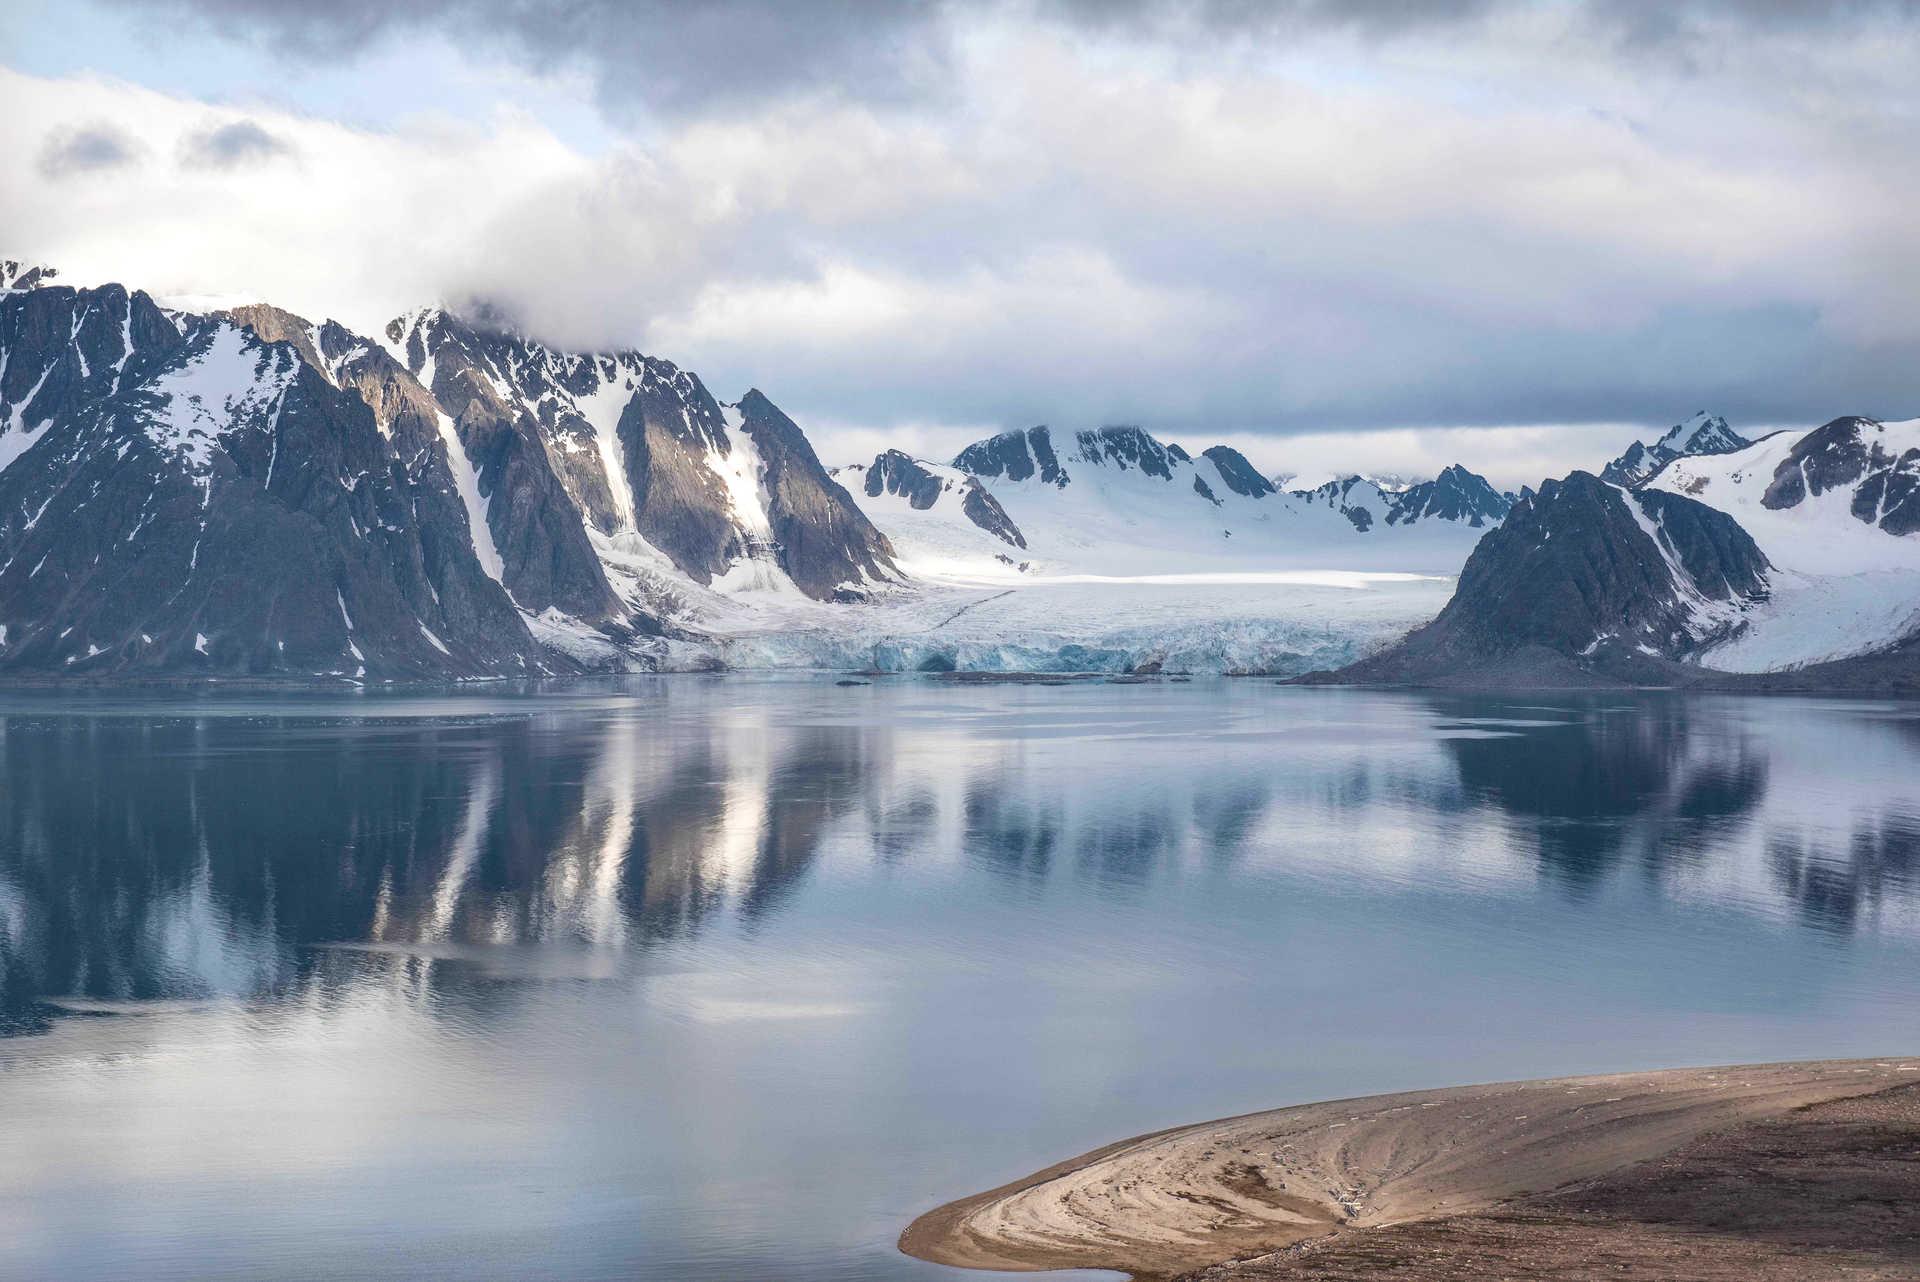 Landscape of the North of Spitsbergen